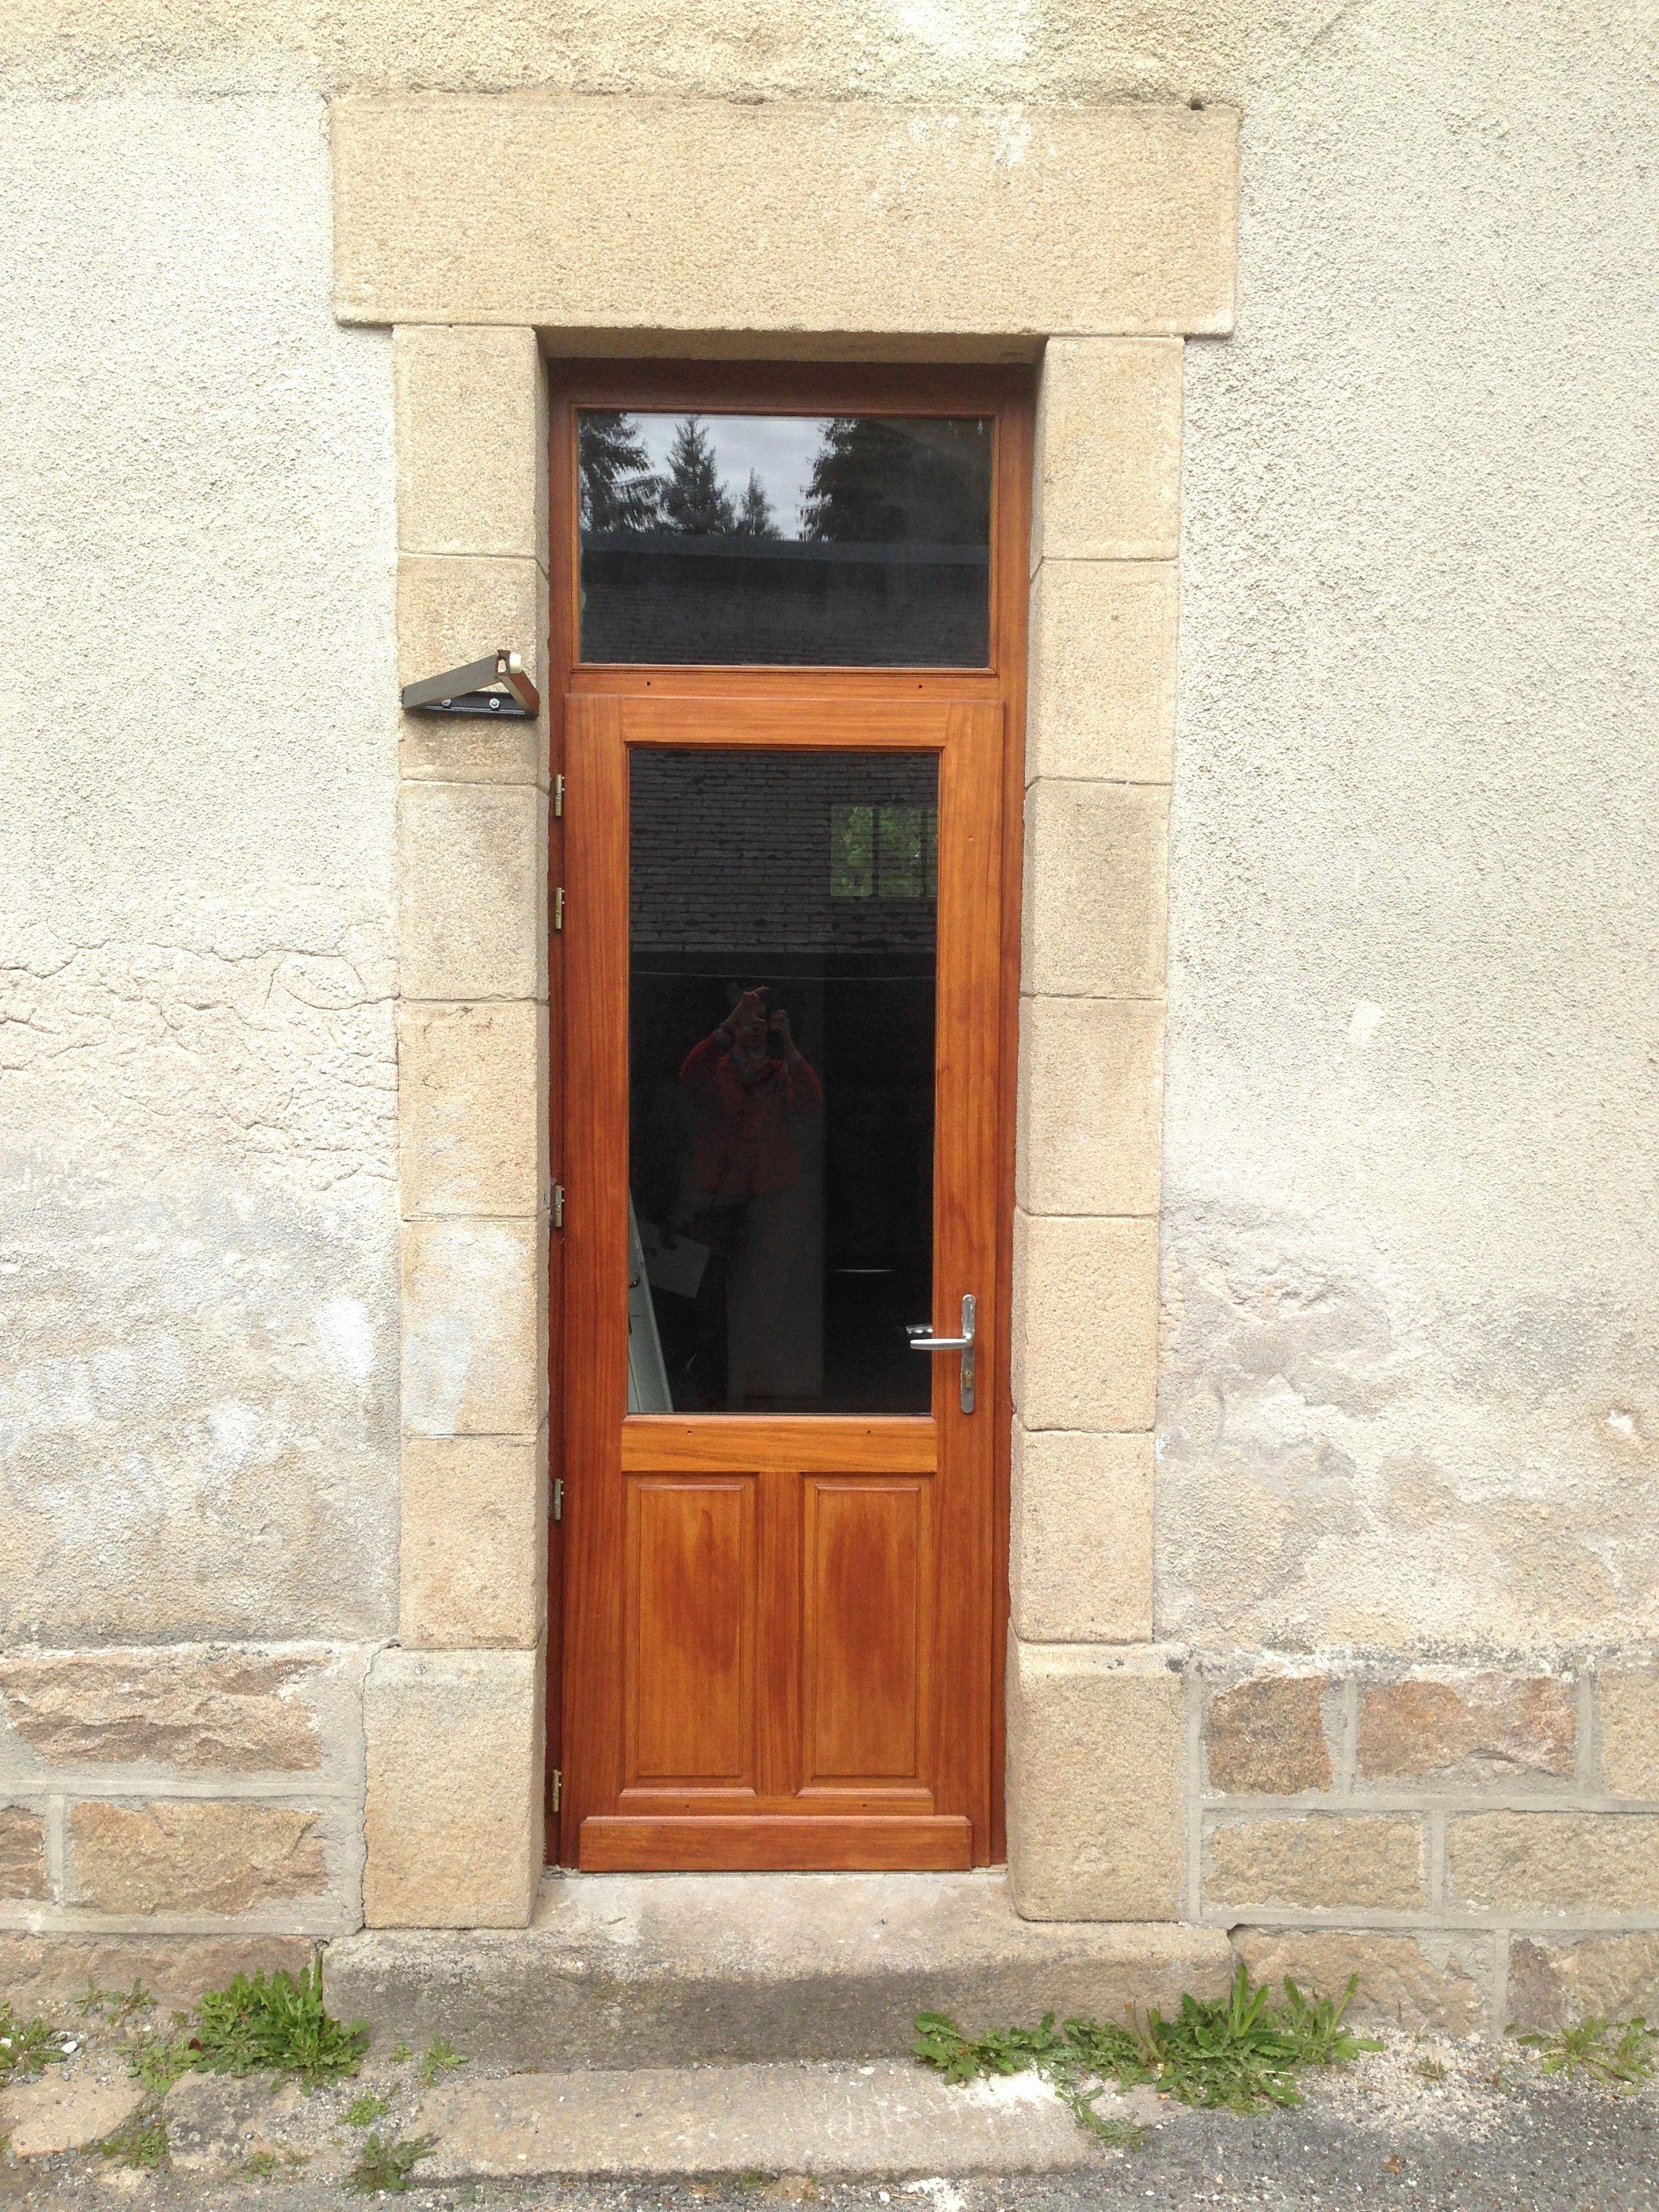 Best Of Castorama Porte De Service Fireplace Decor Home